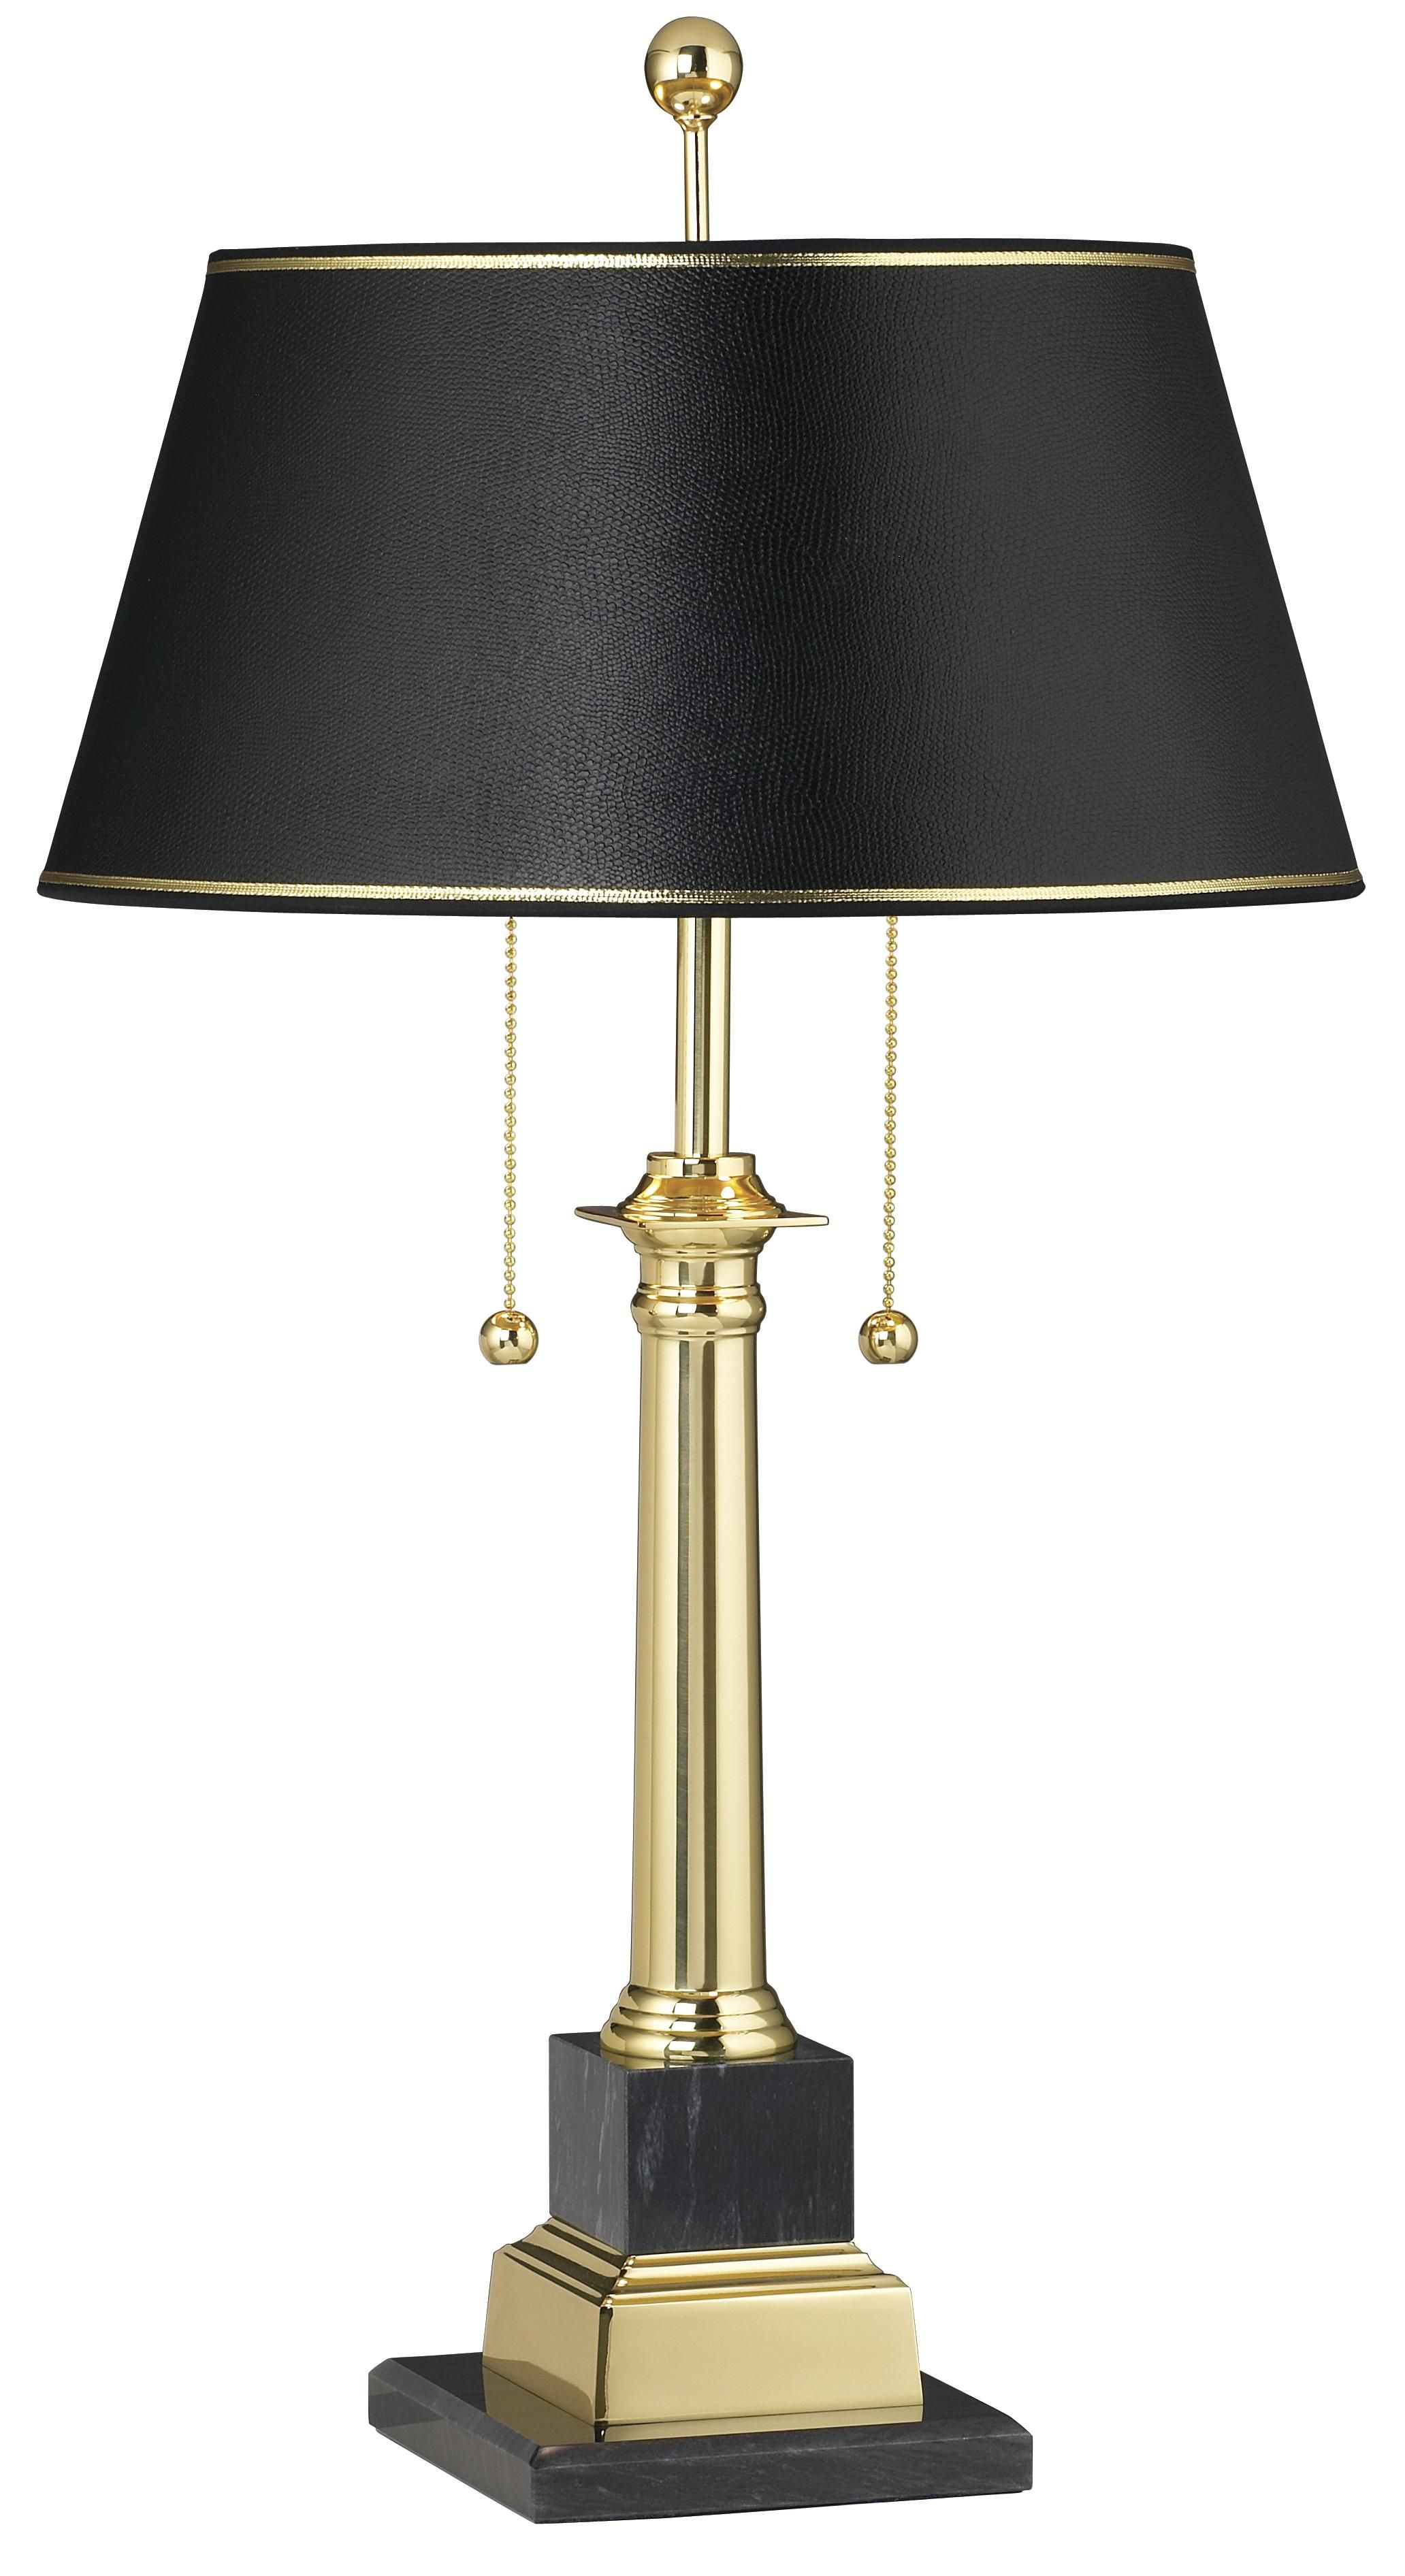 Decorative Desk Lamps georgetown solid brass desk lamp -   lamps   pinterest   desk lamp